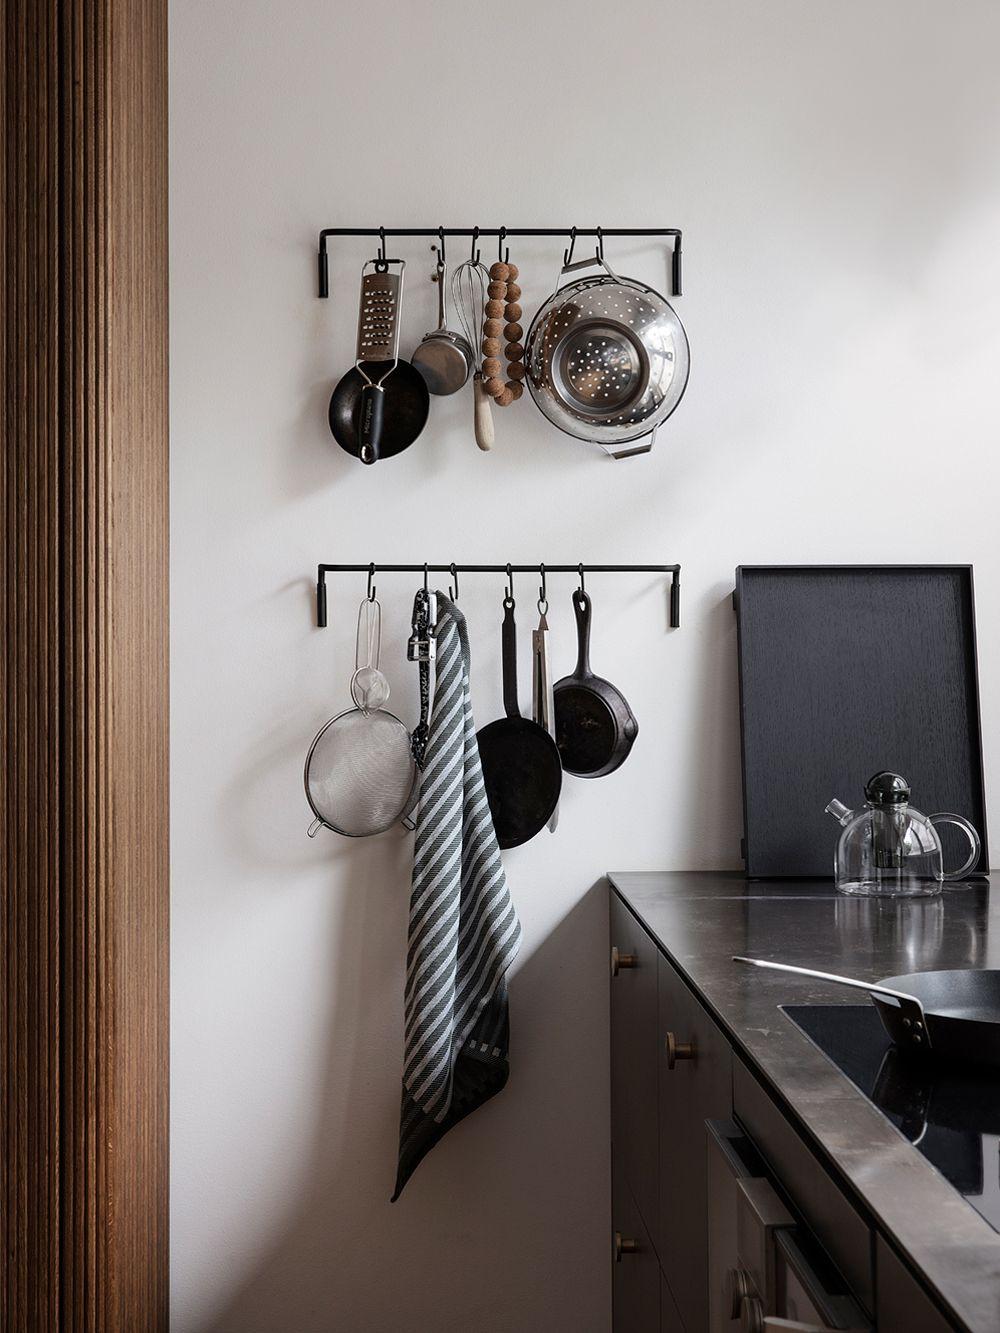 Ferm Living Kitchen rods